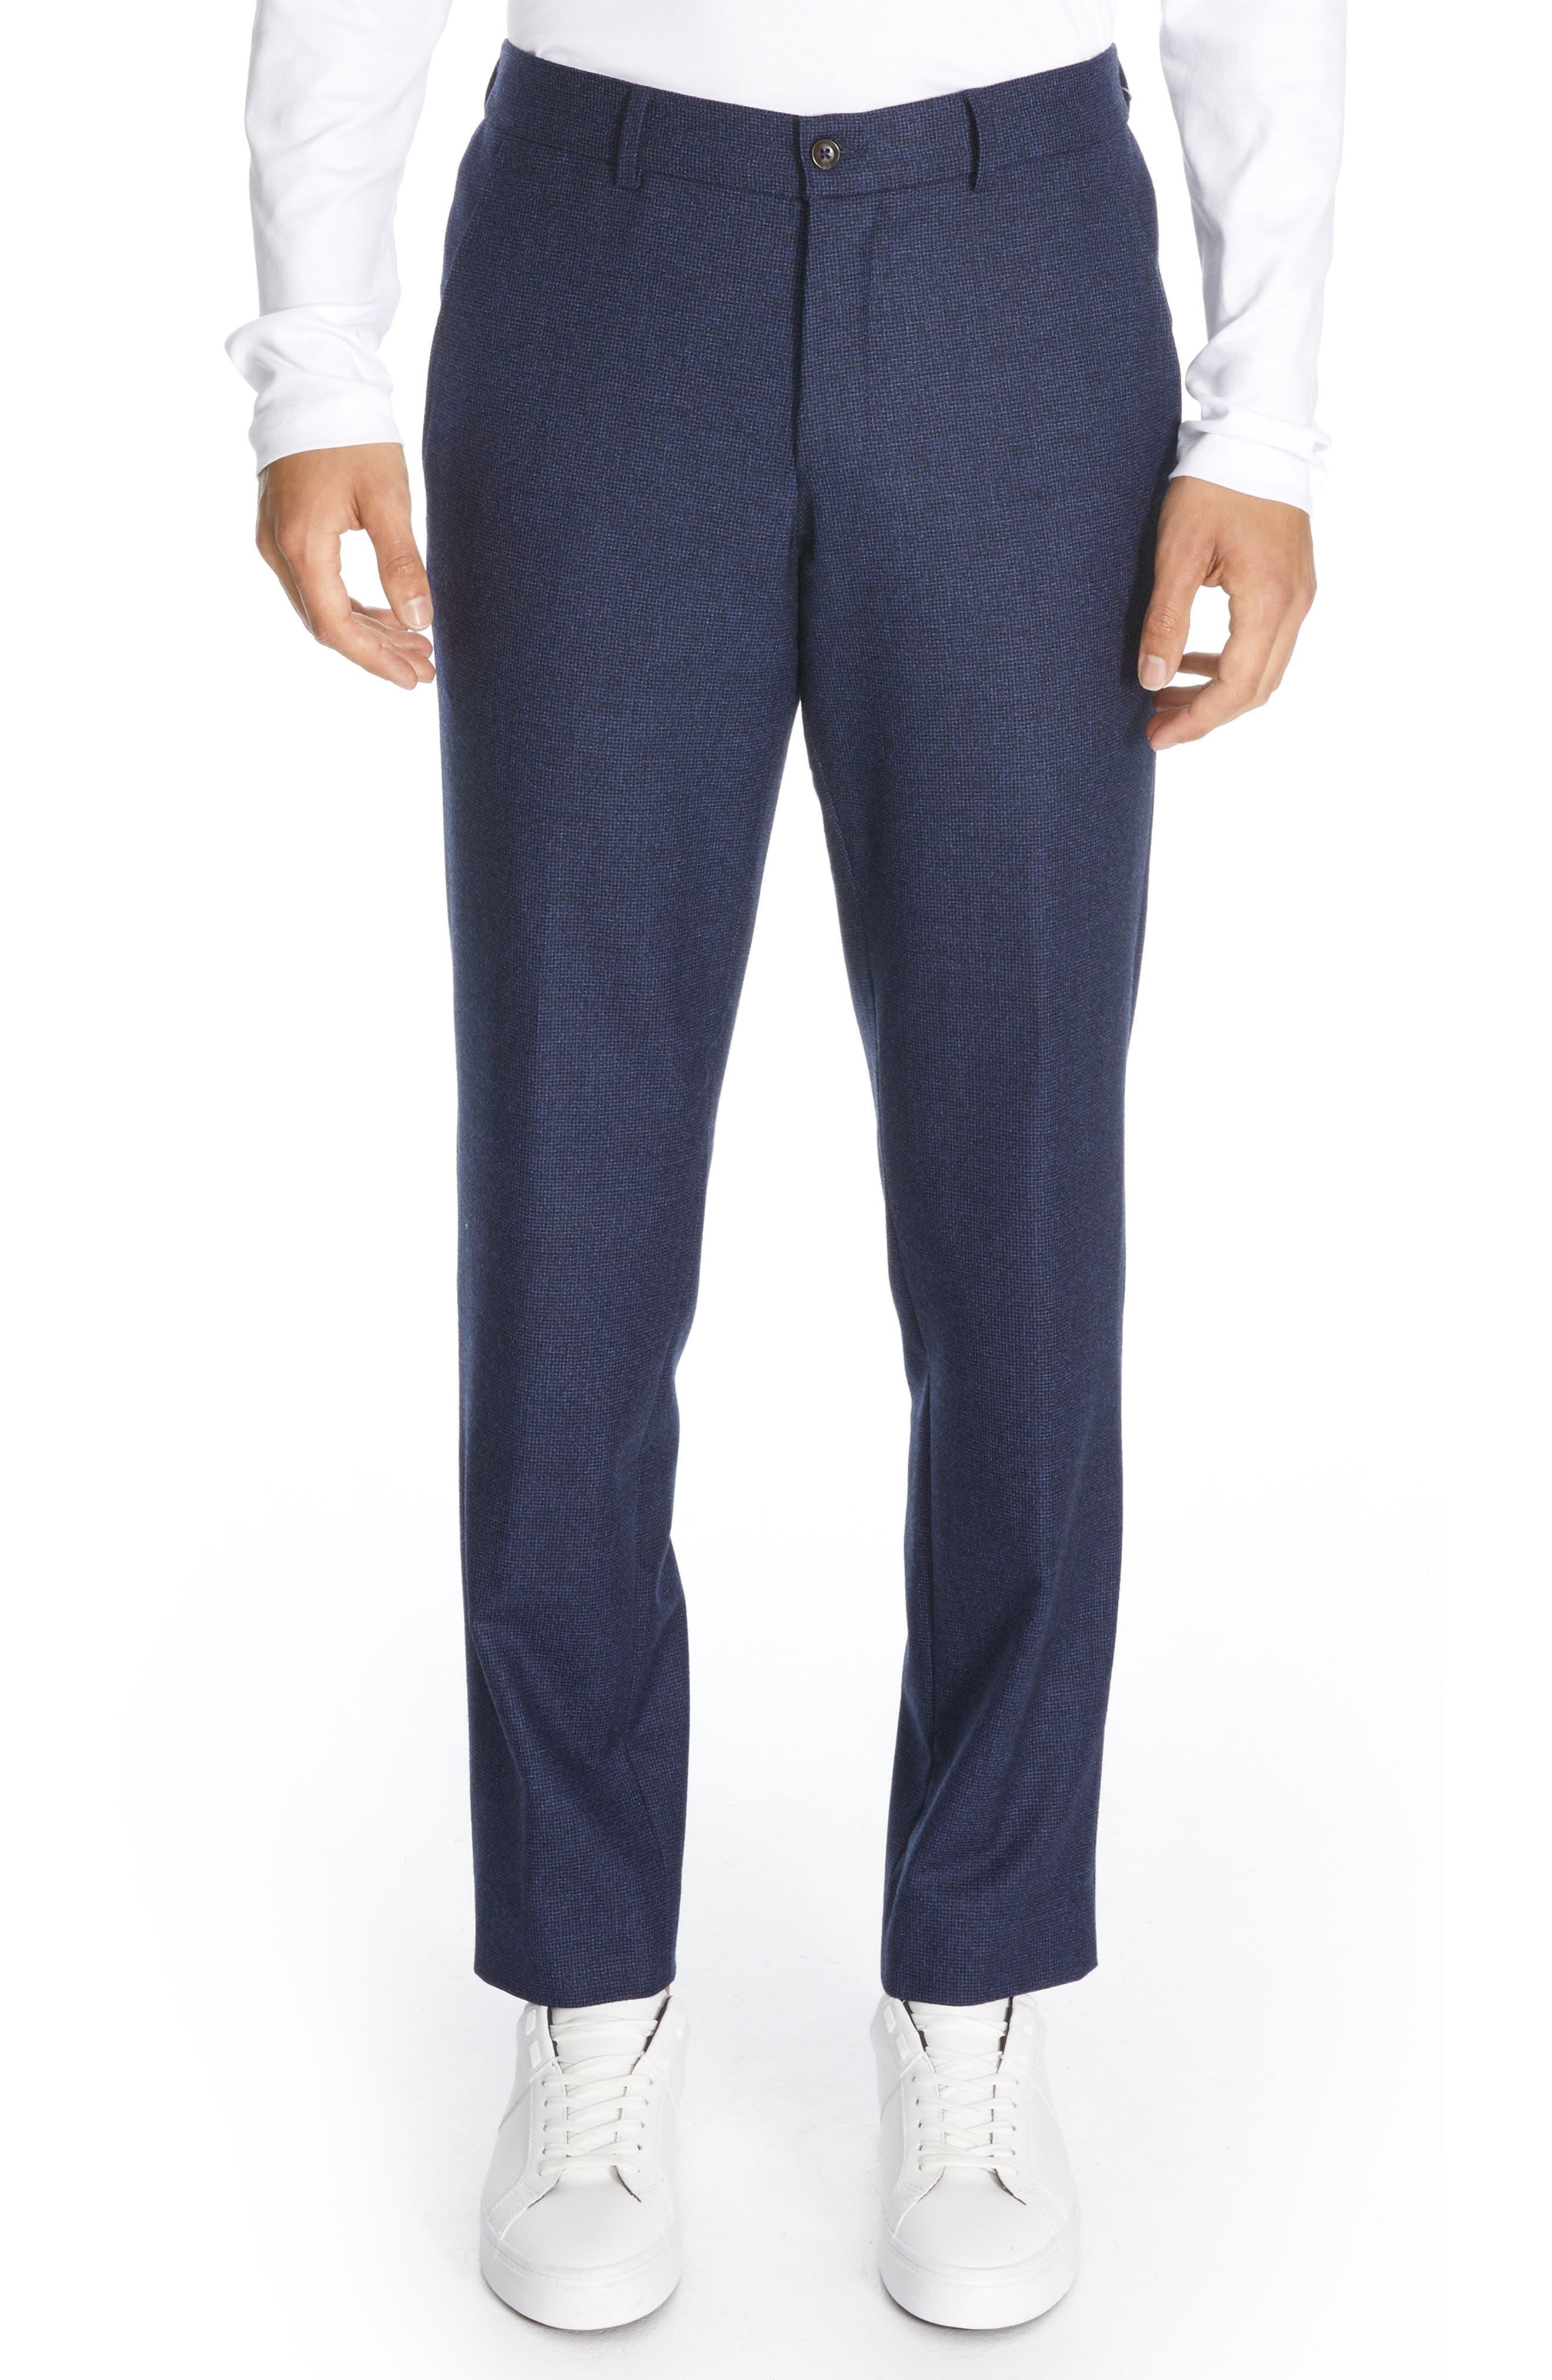 Jordan Stretch Wool Trousers